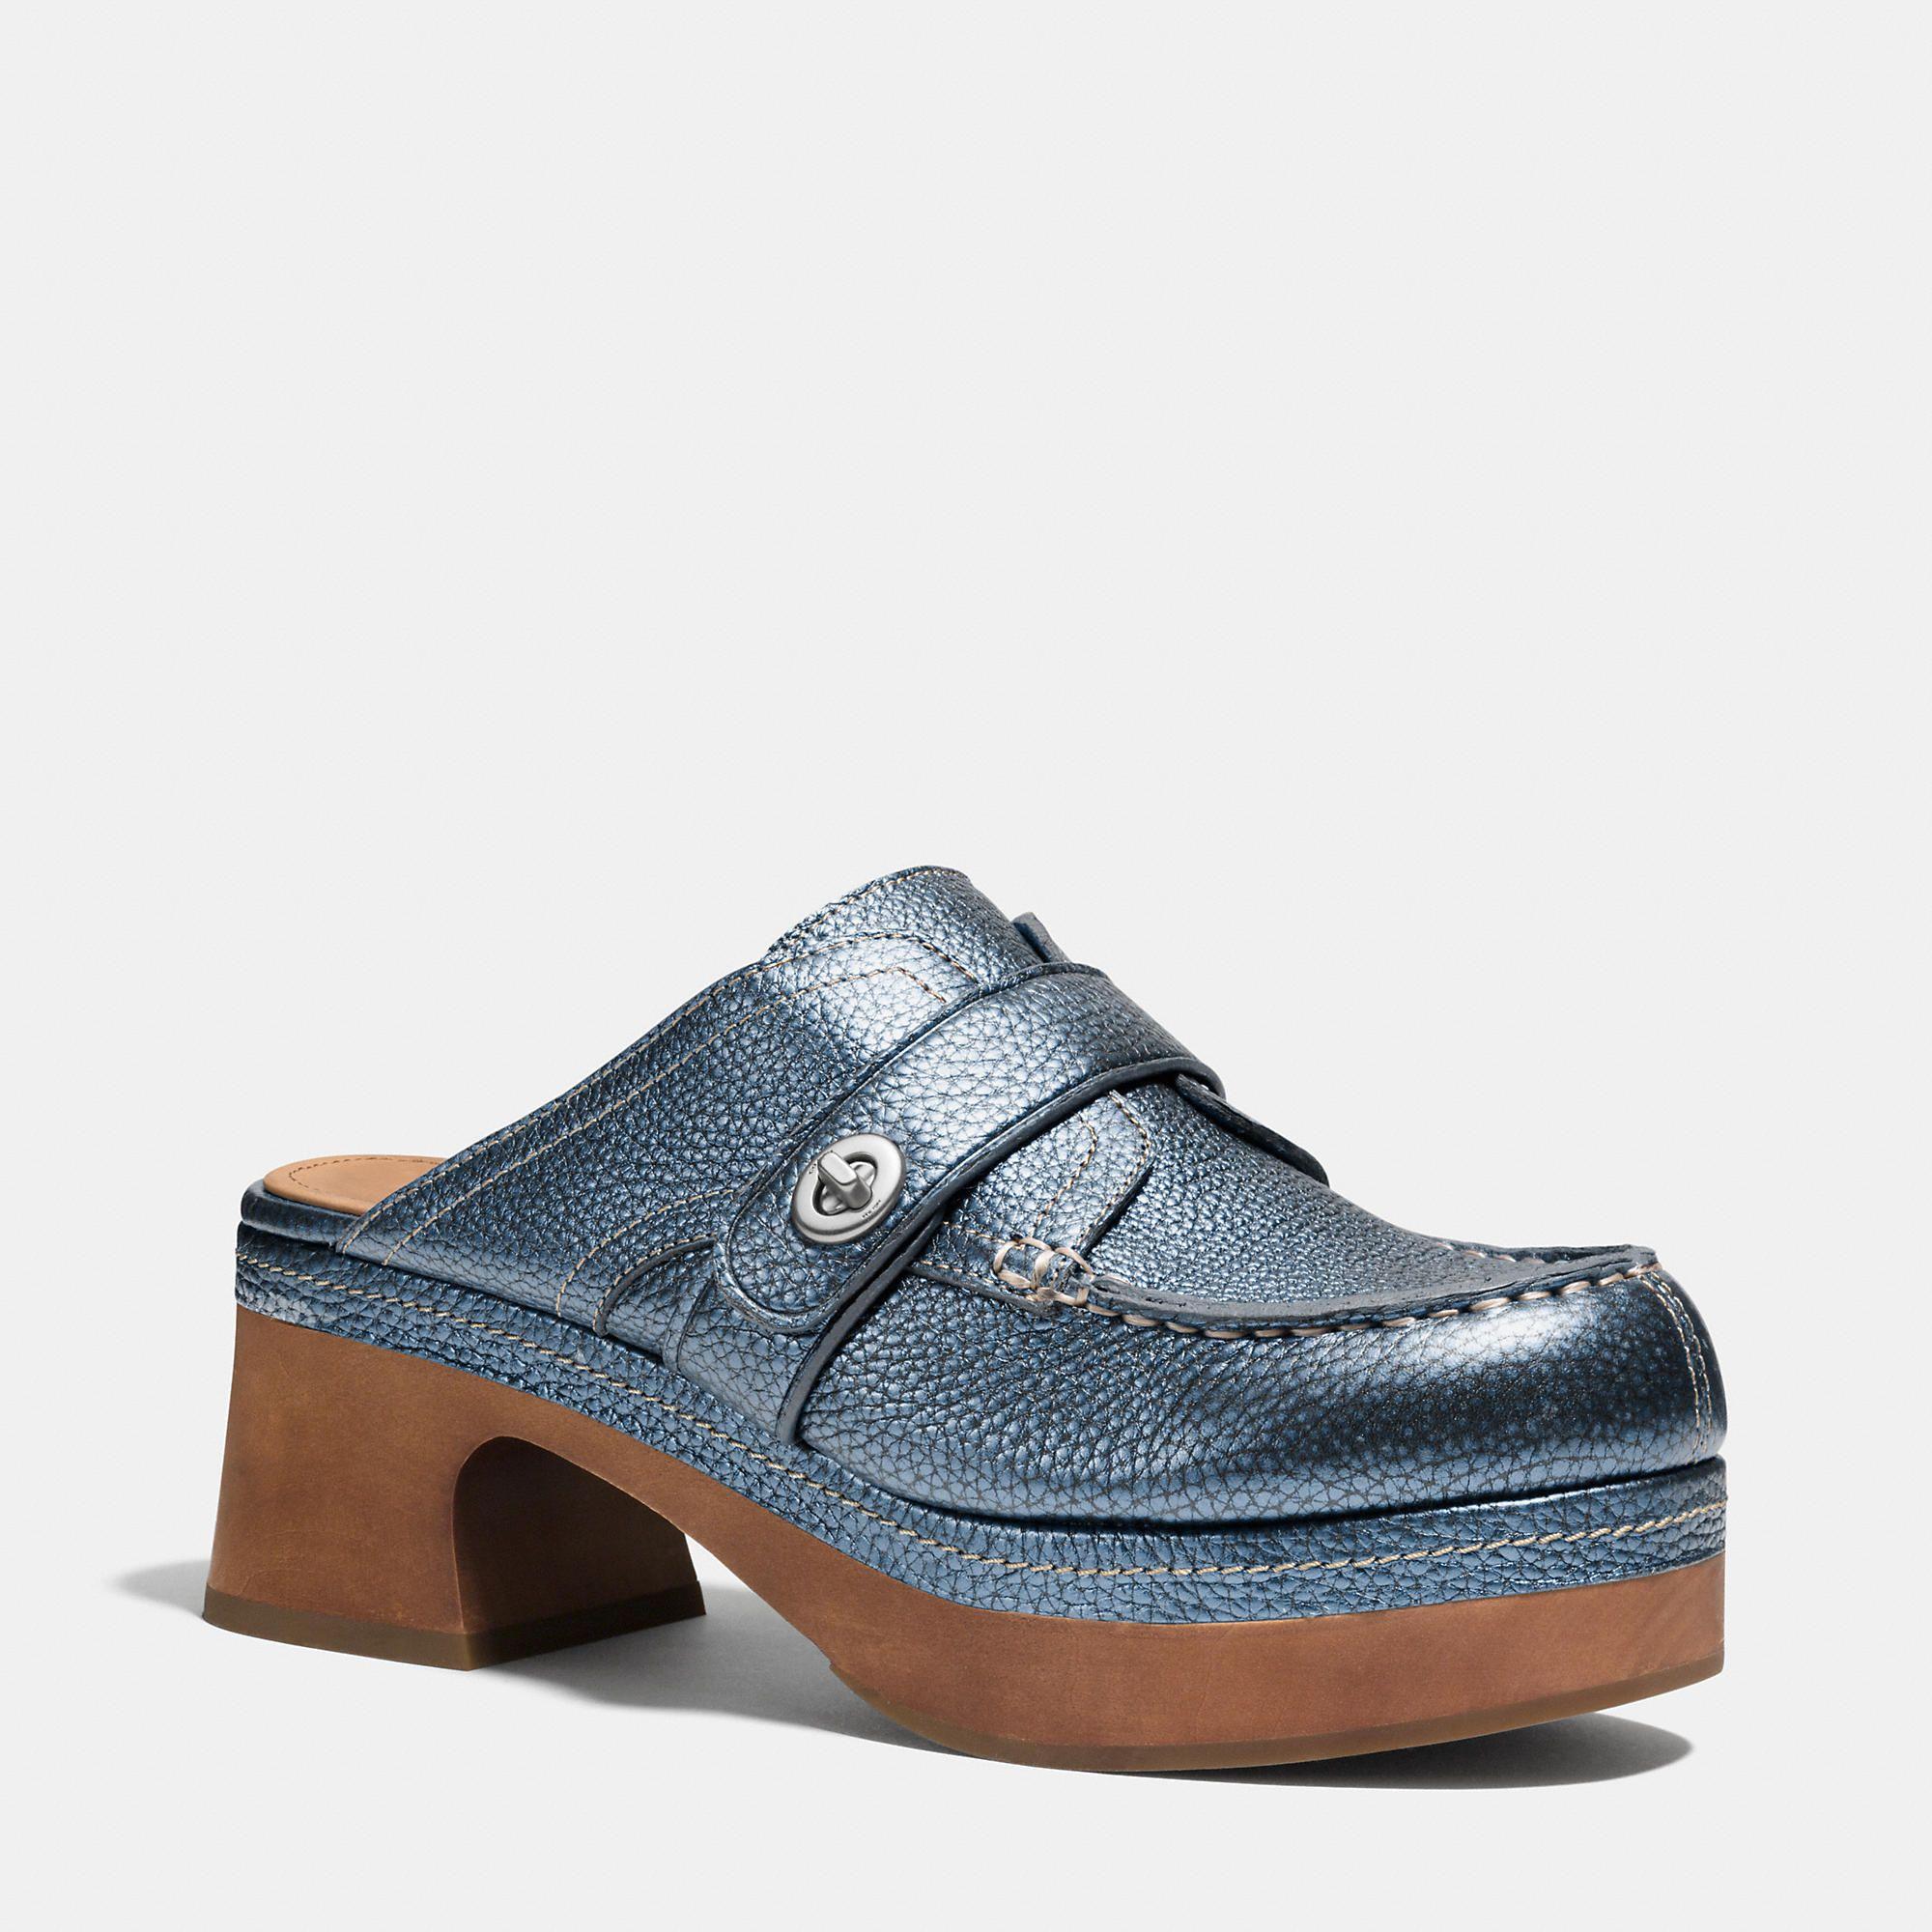 "Coach Turnlock Mid-Heel Clog, $345;&amp;nbsp;&lt;a href=""http://www.coach.com/coach-designer-clogs-turnlock-mid-heel-clog/Q7155.html?dwvar_color=E6A&amp;amp;cgid=women-shoes""&gt;coach.com&lt;/a&gt;  <!--EndFragment-->"